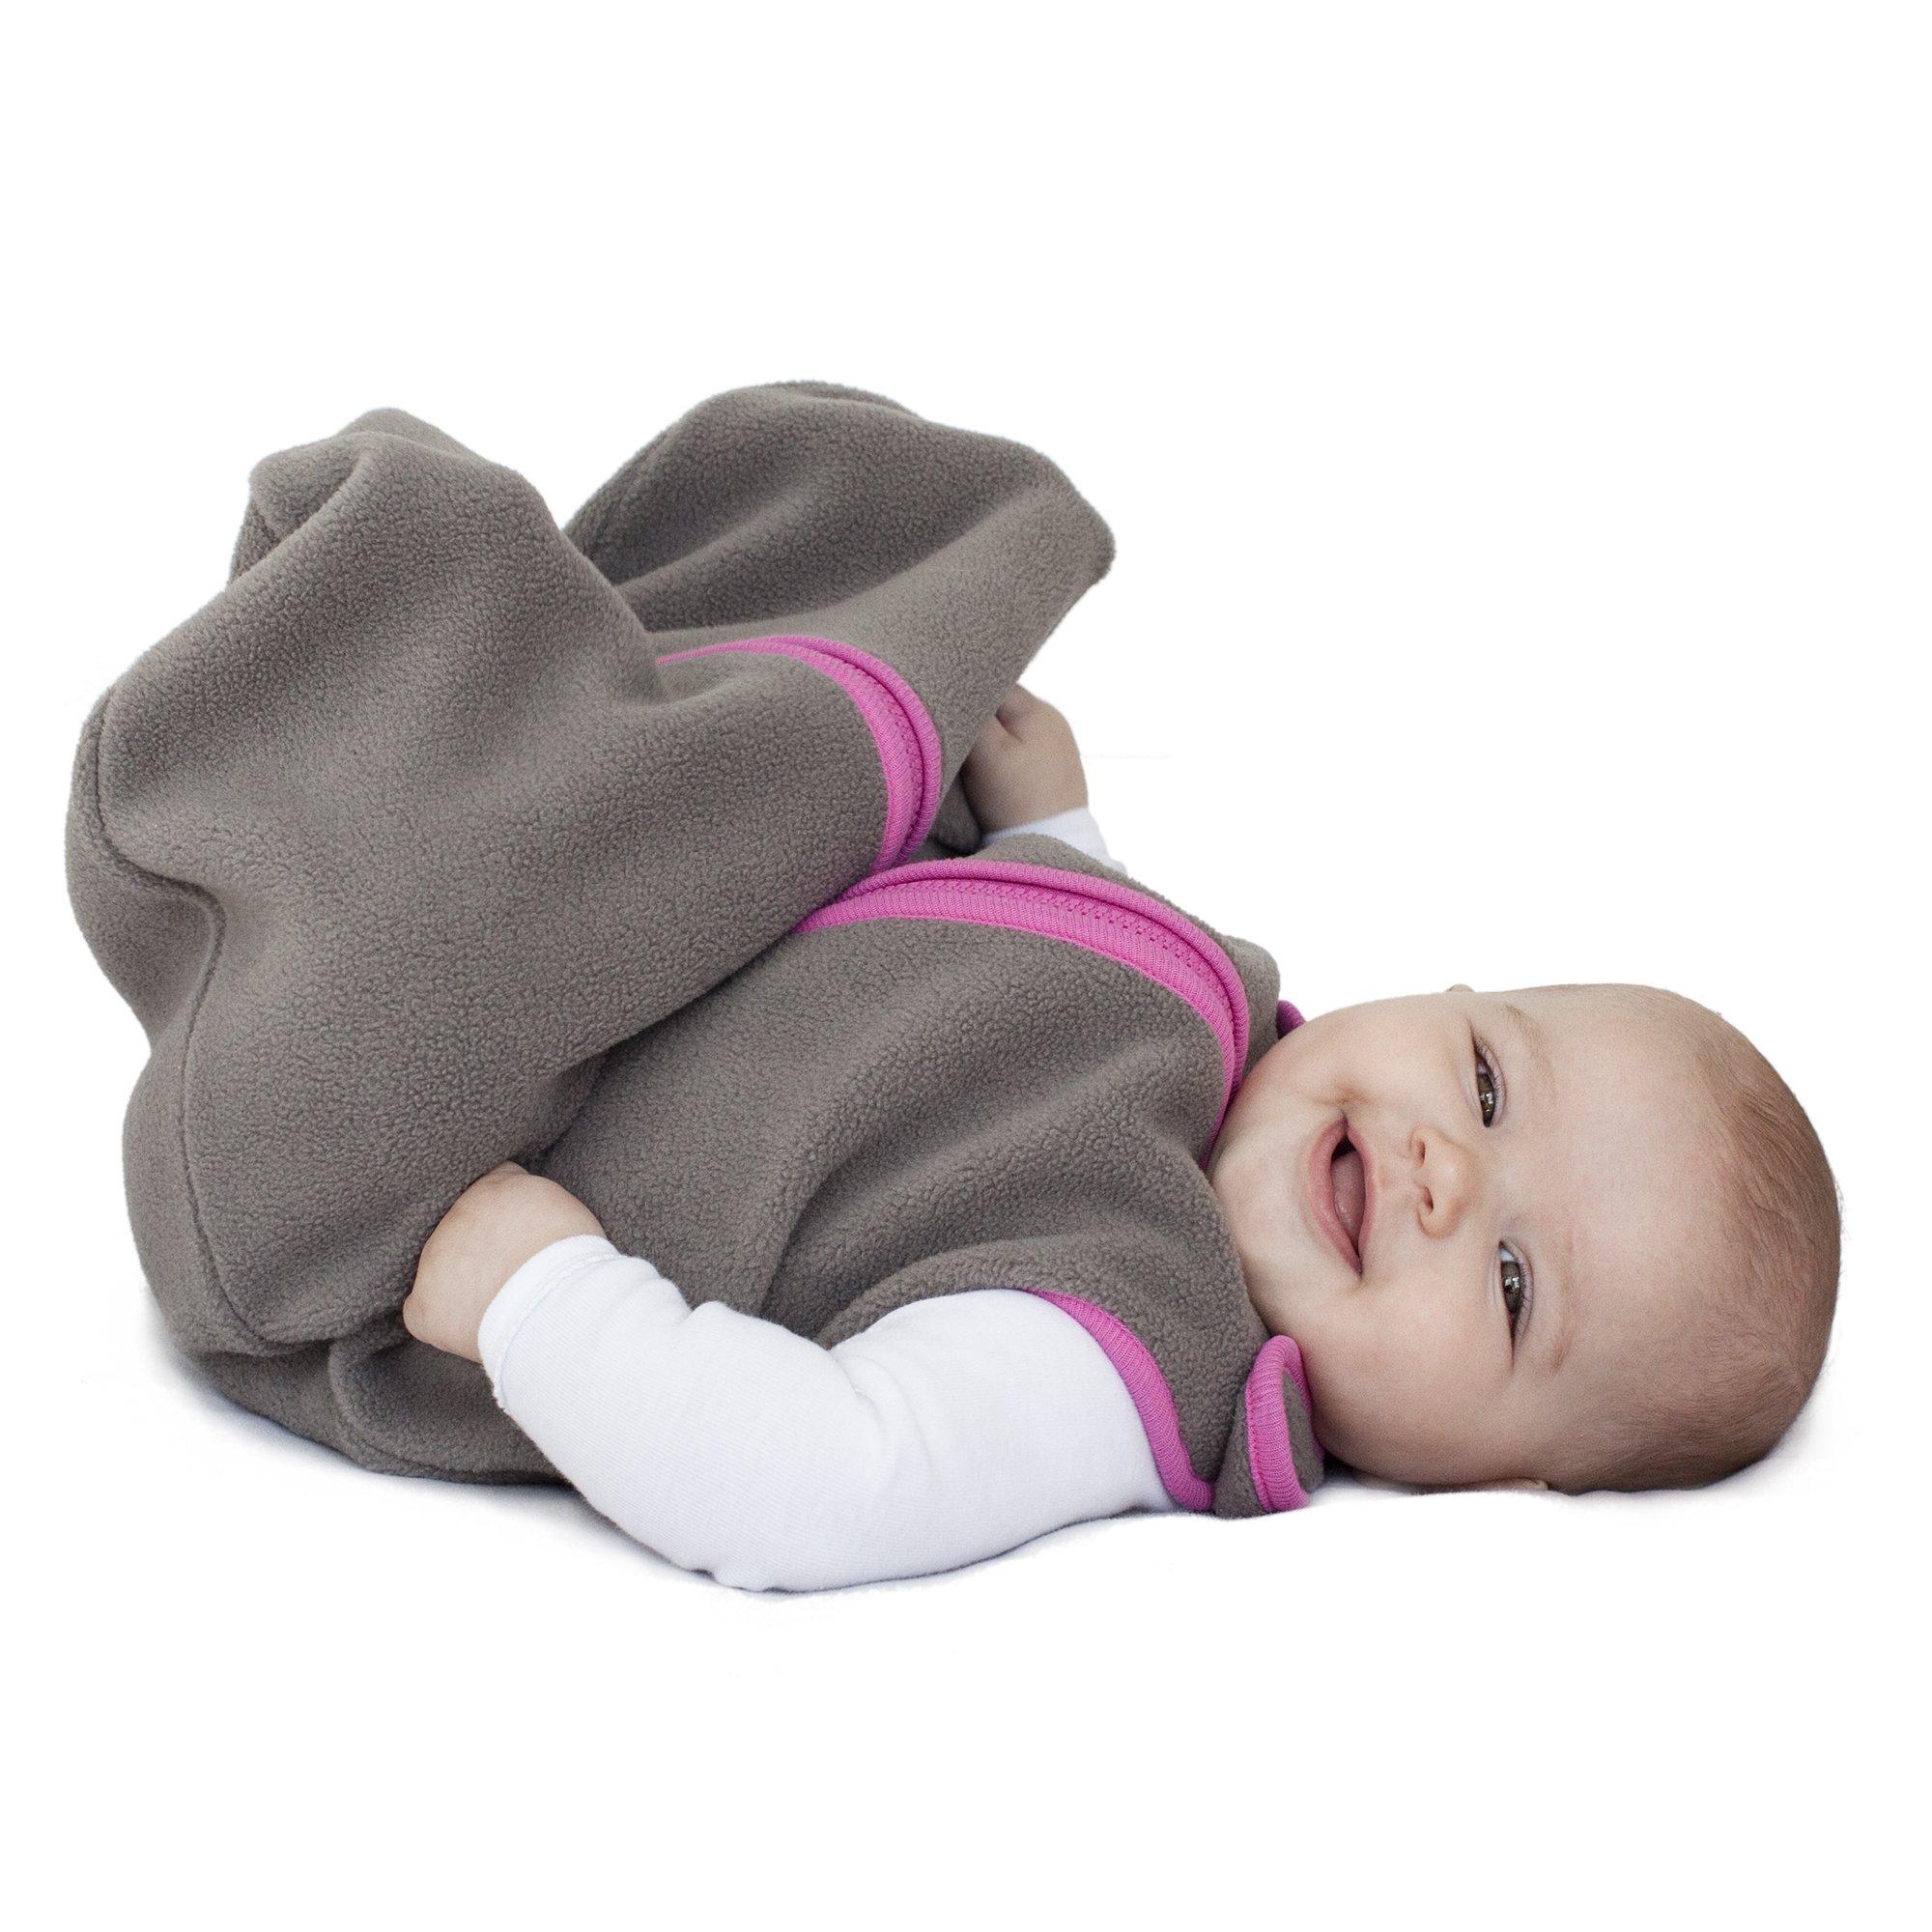 baby deedee Sleep Nest Fleece Wearable Blanket, Slate/Hot Pink, Small (0-6 Months) by baby deedee